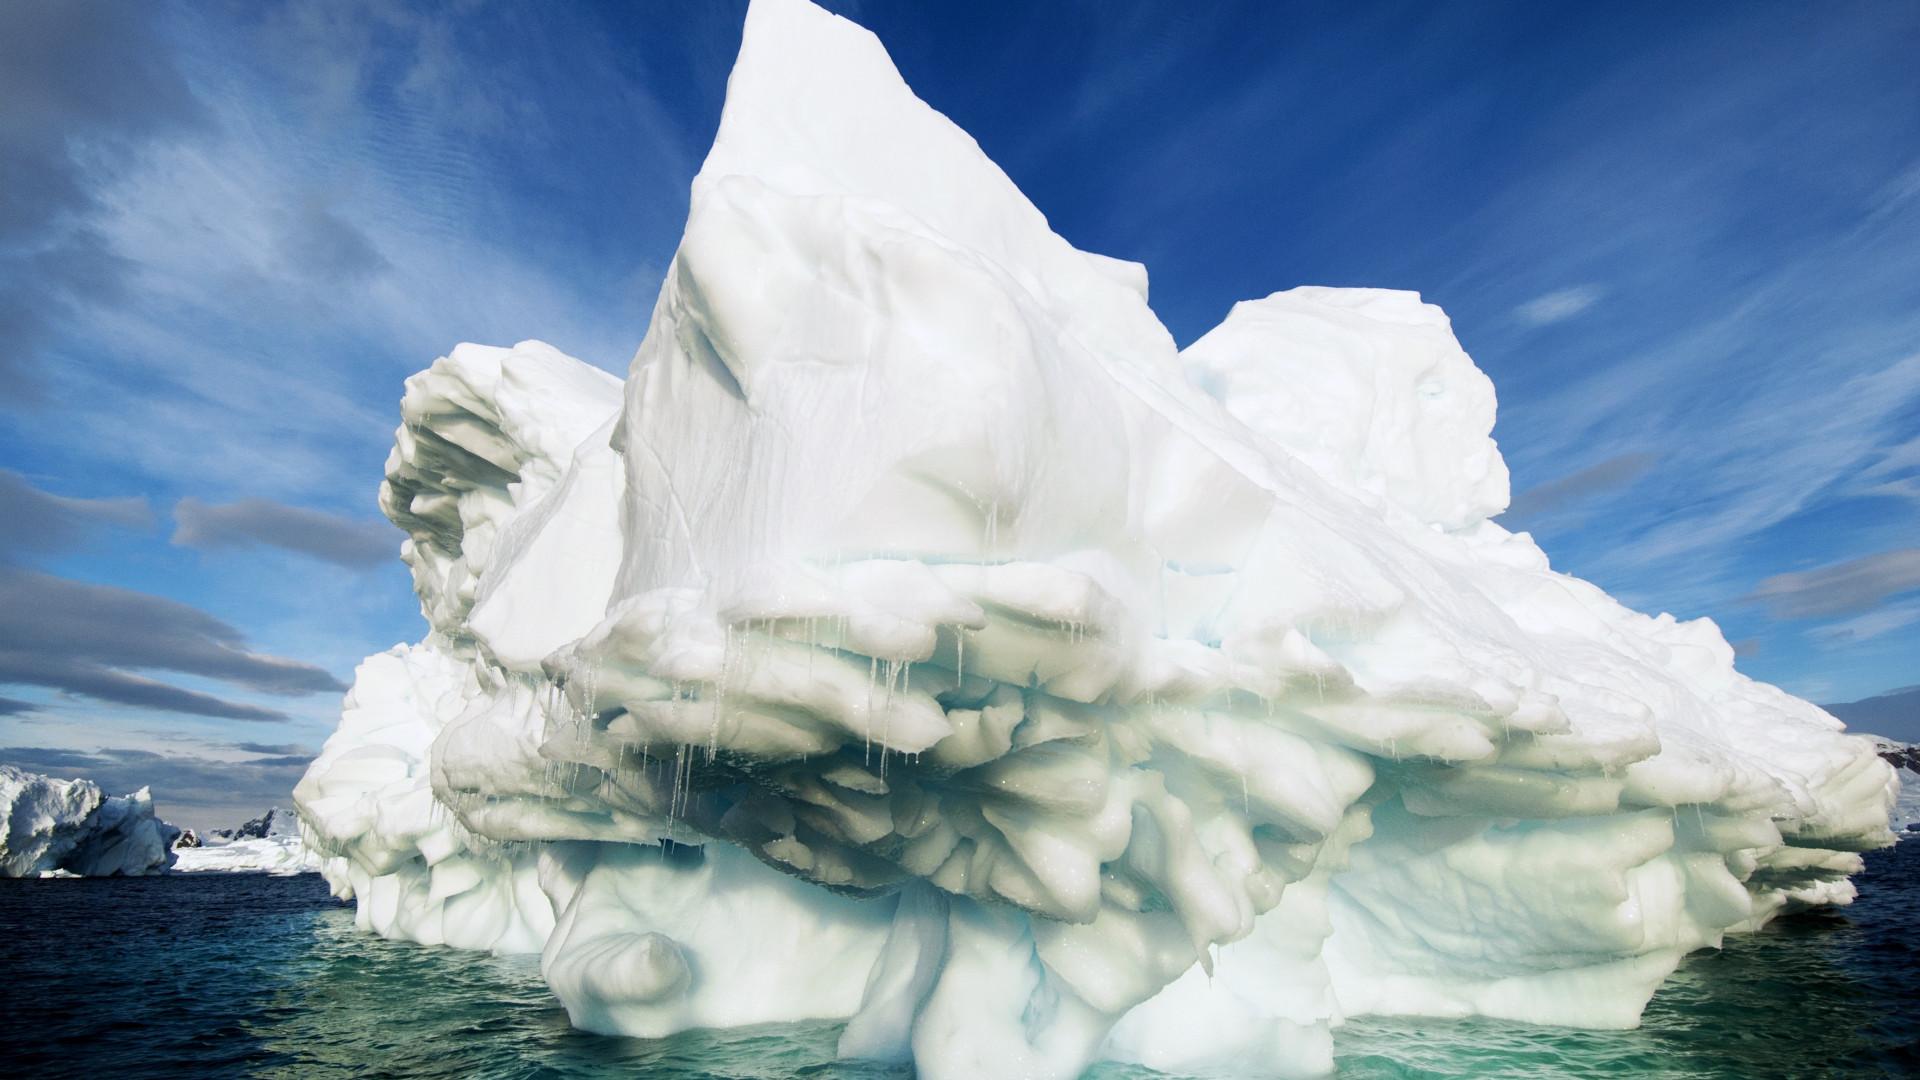 Exploding ice in Antarctica